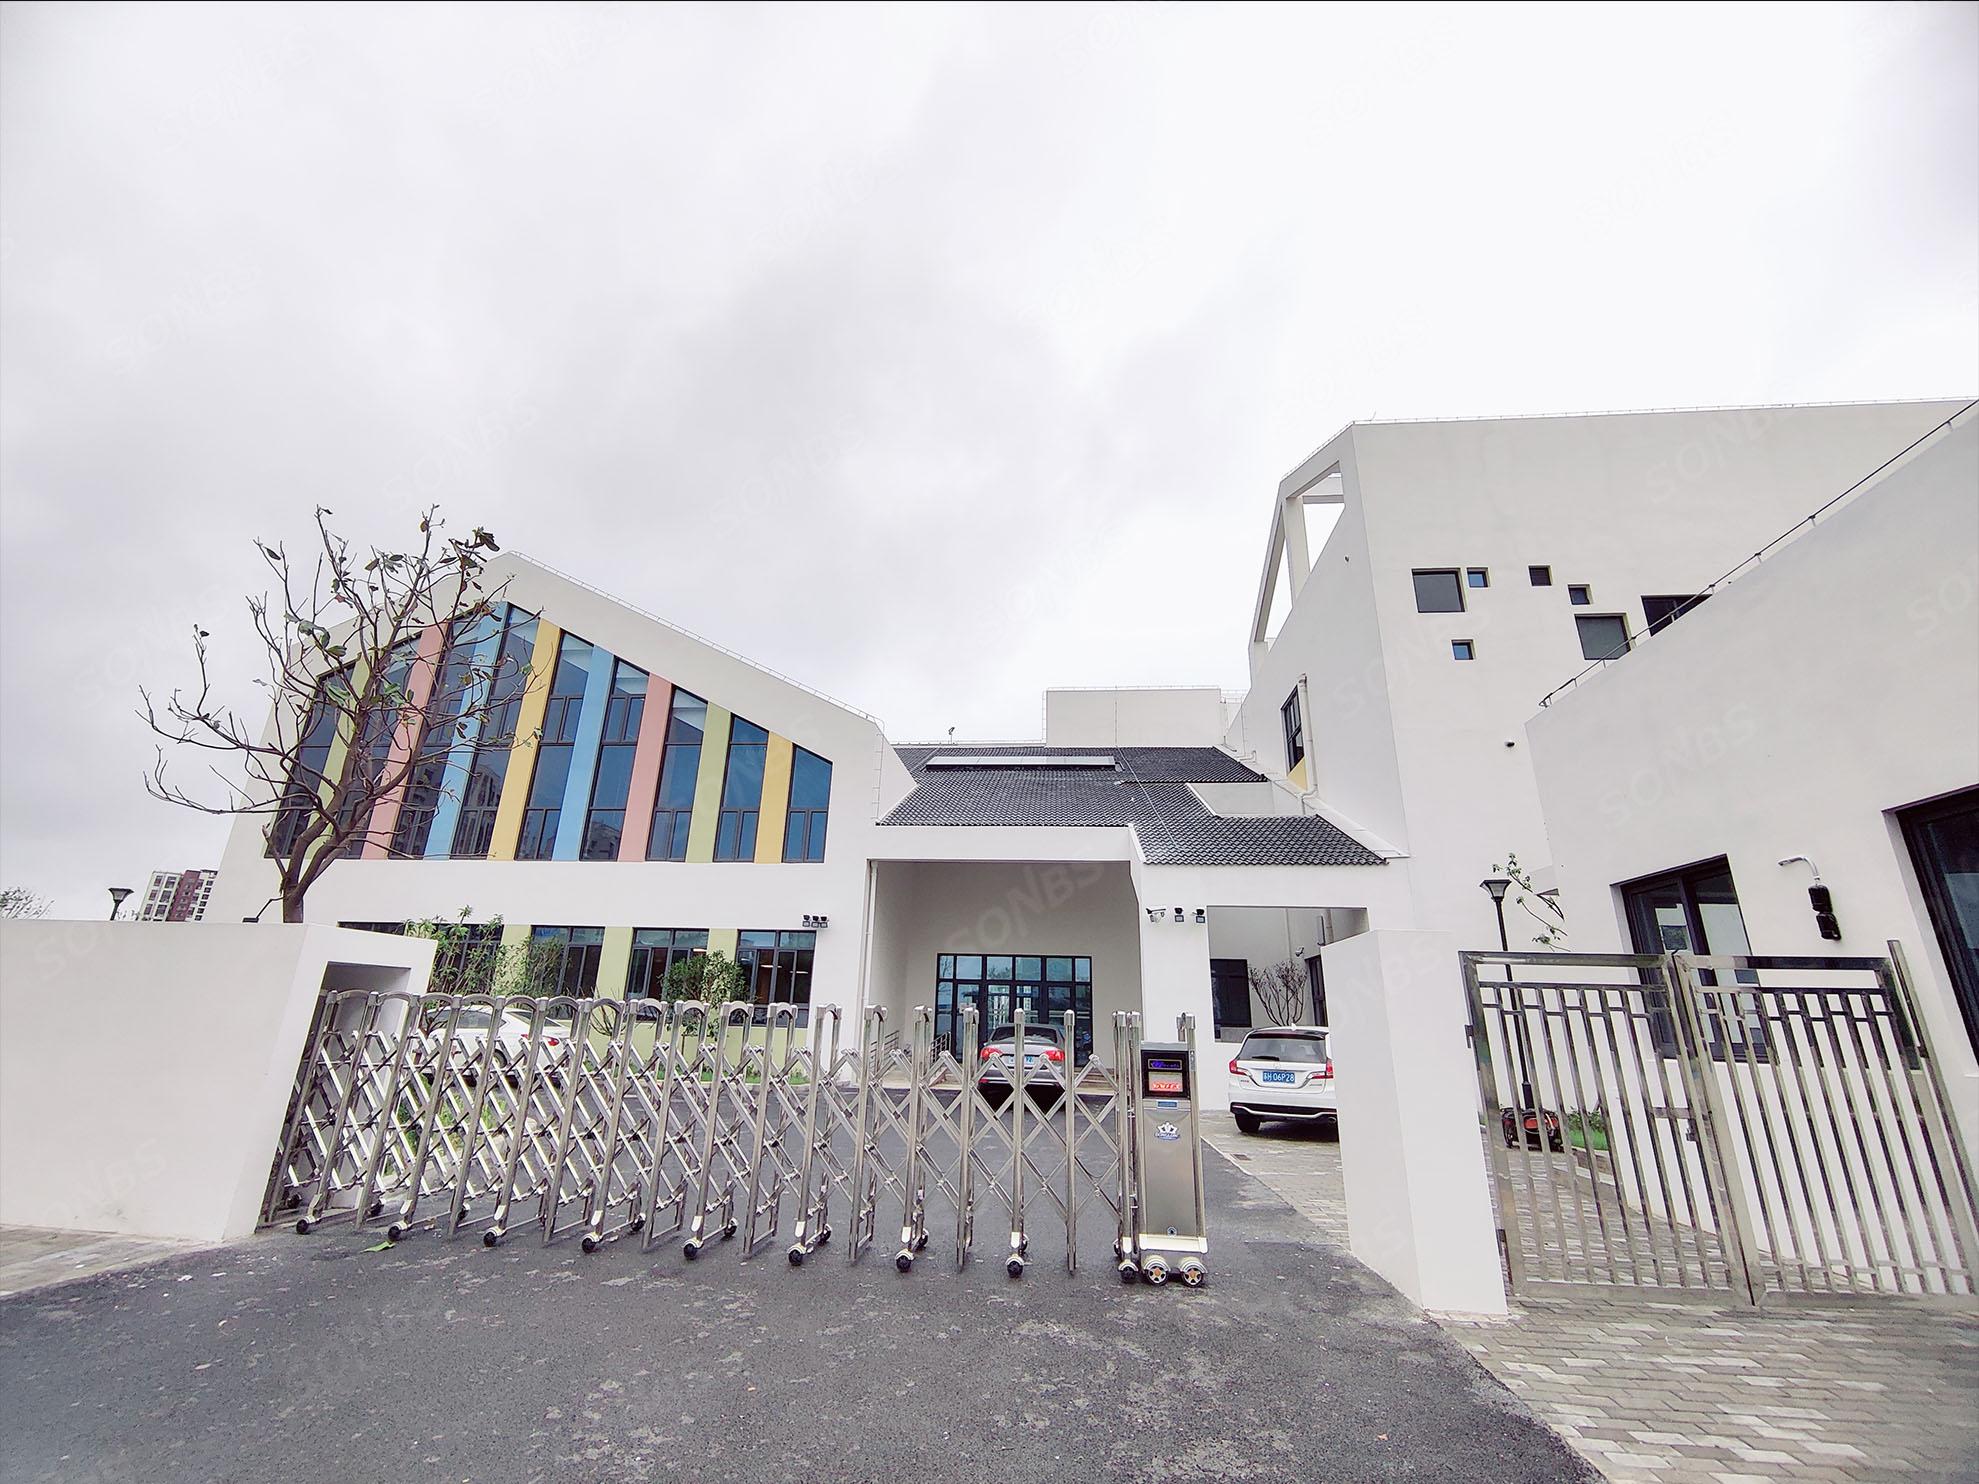 SONBS 智慧云平台IP网络广播系统成功应用于上海青浦新城幼儿园